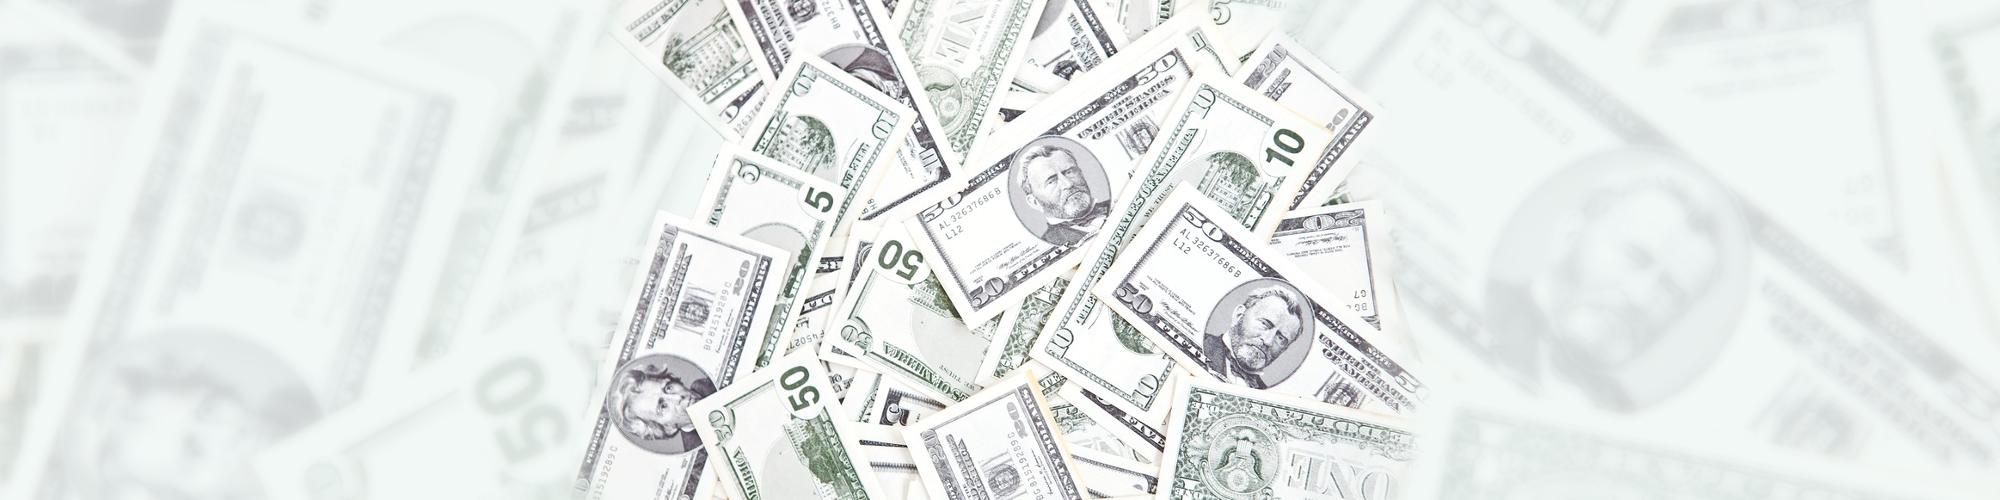 DDoS Attacks Rampant in Financial Sector